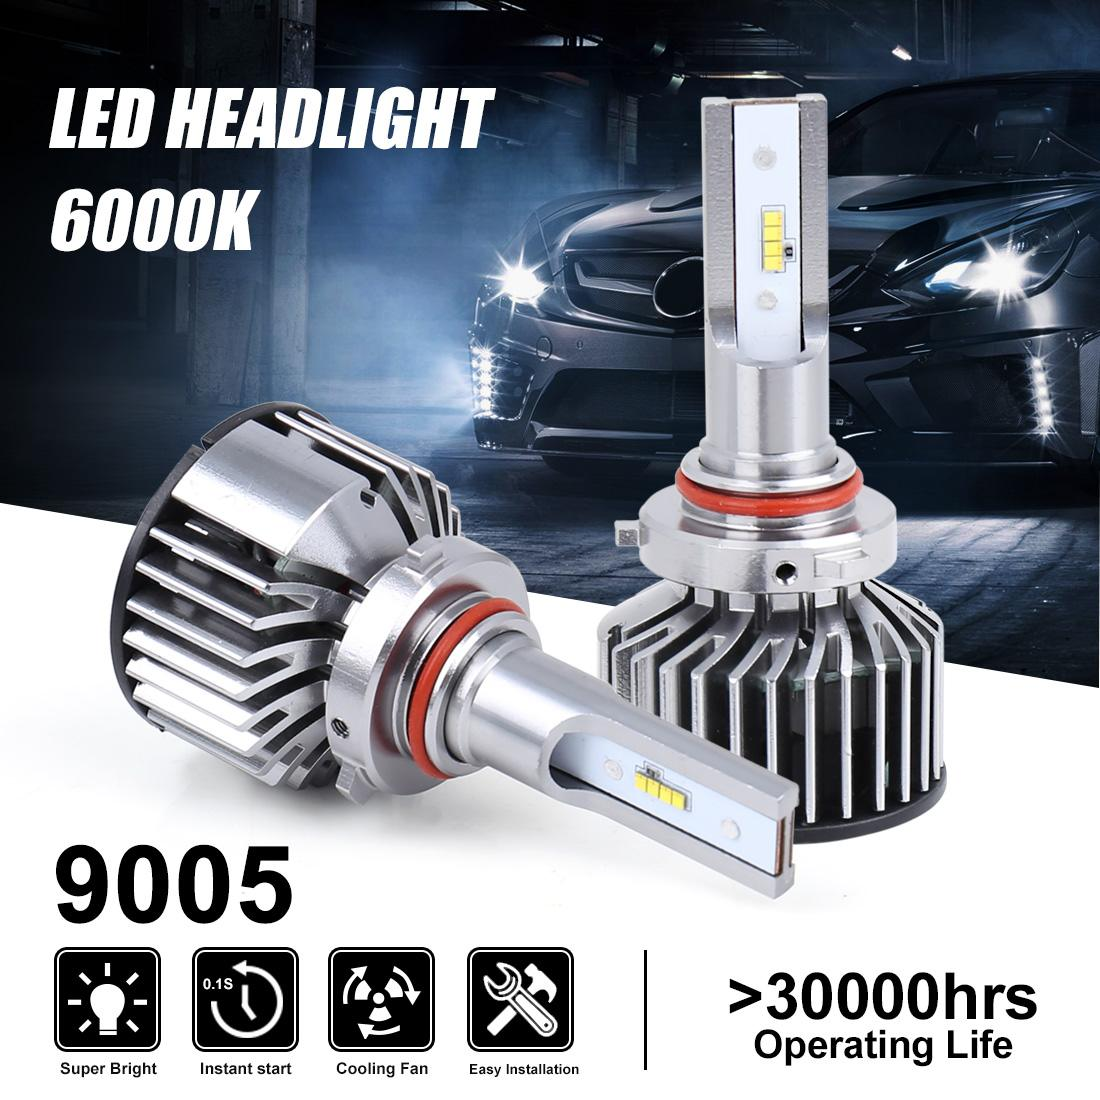 Genuine K8 9005/9012/H1/H3/H4/H7/H11 Car for Philips LED Headlights 6000K 6800LM 55W